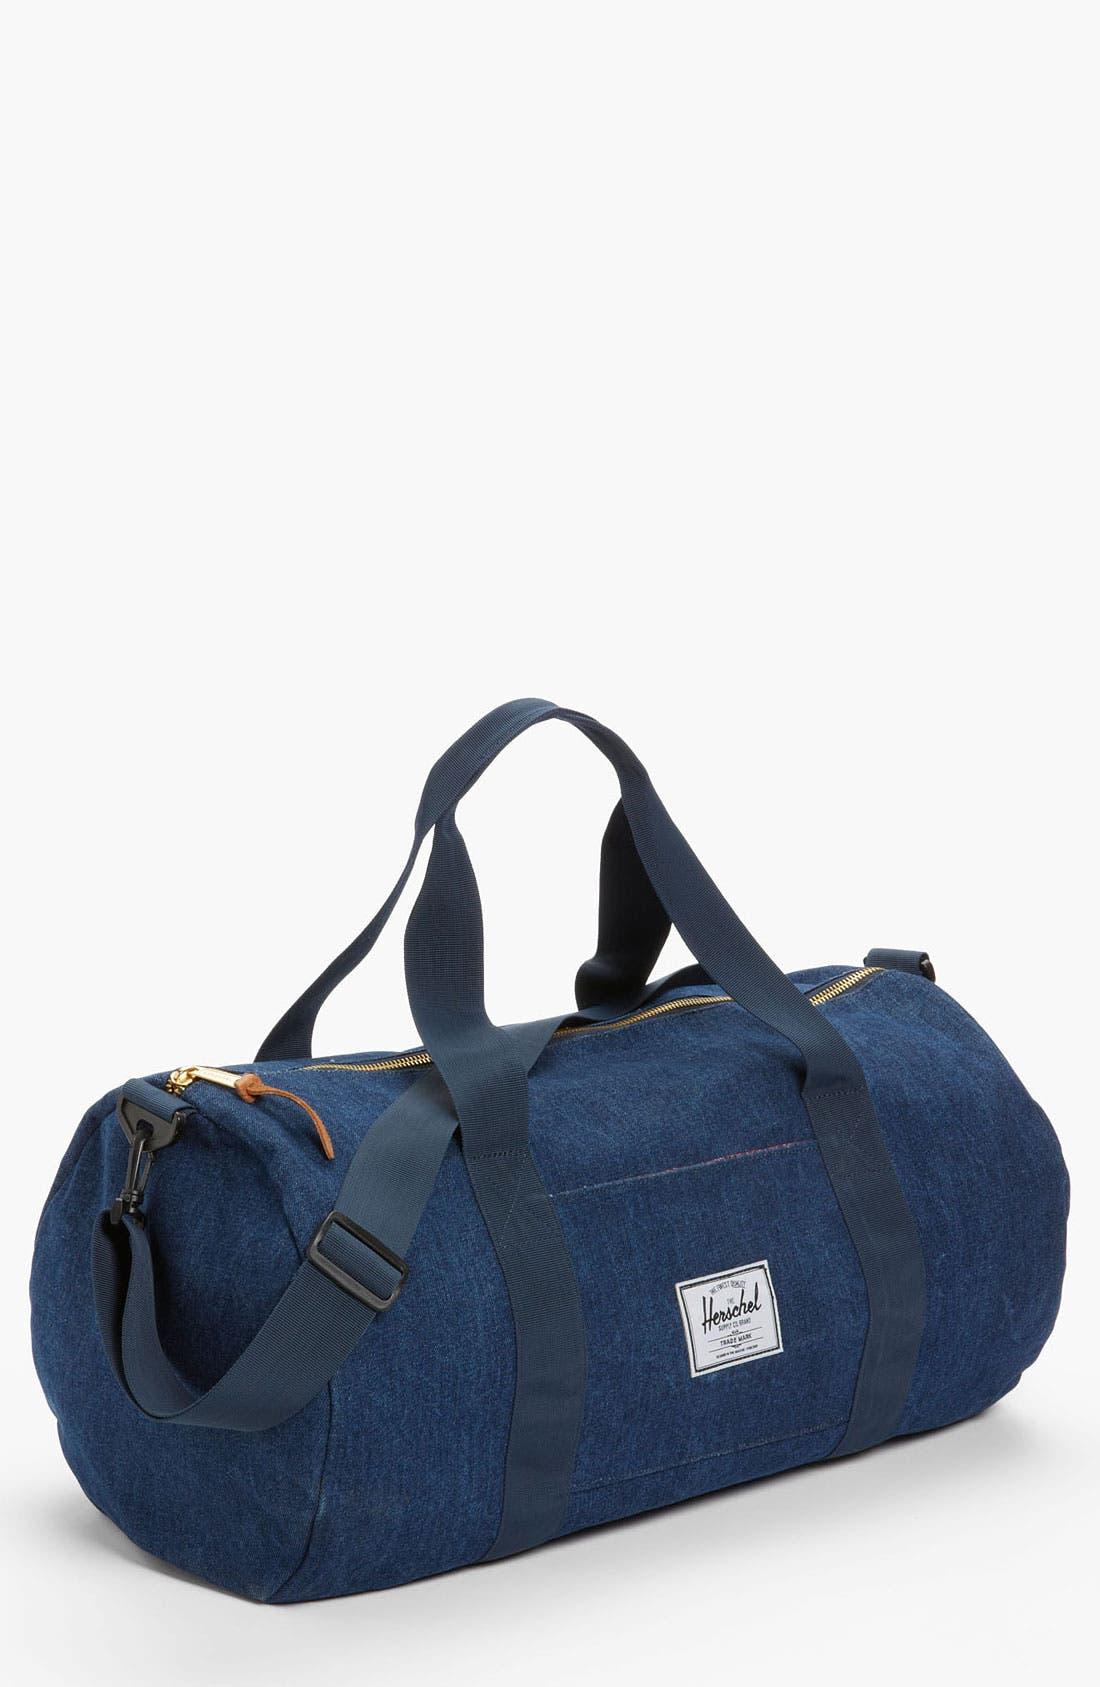 Main Image - Herschel Supply Co. 'Sutton - Denim Collection' Duffel Bag